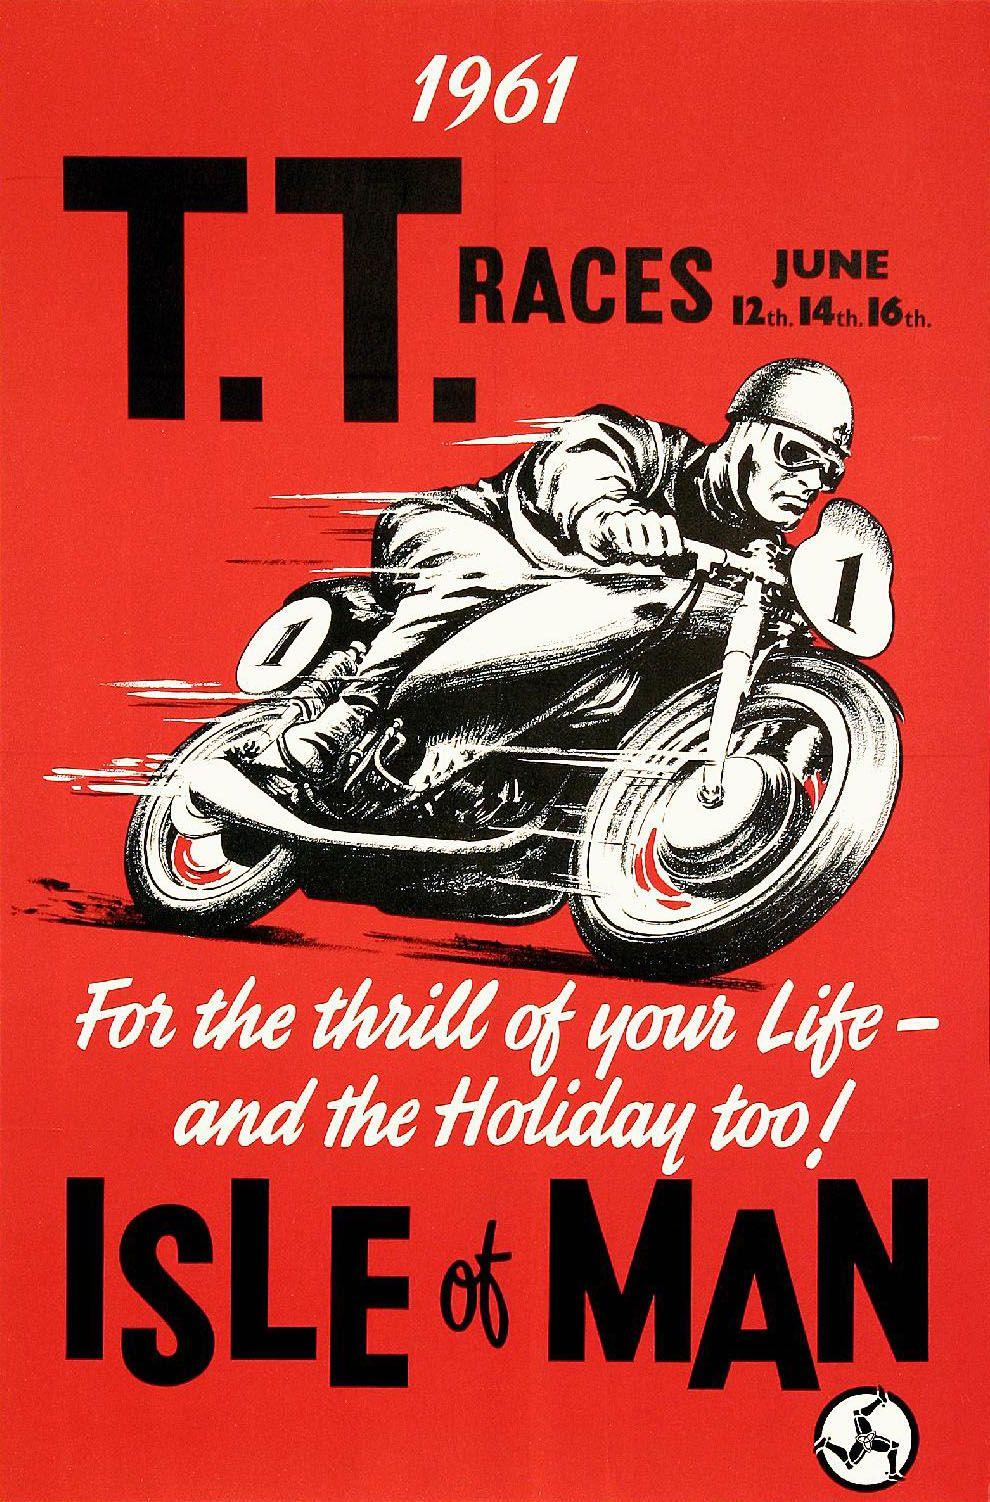 Isle Of Man Tt 1961 Poster Silodrome Vintage Motorcycle Posters Motorcycle Posters Isle Of Man